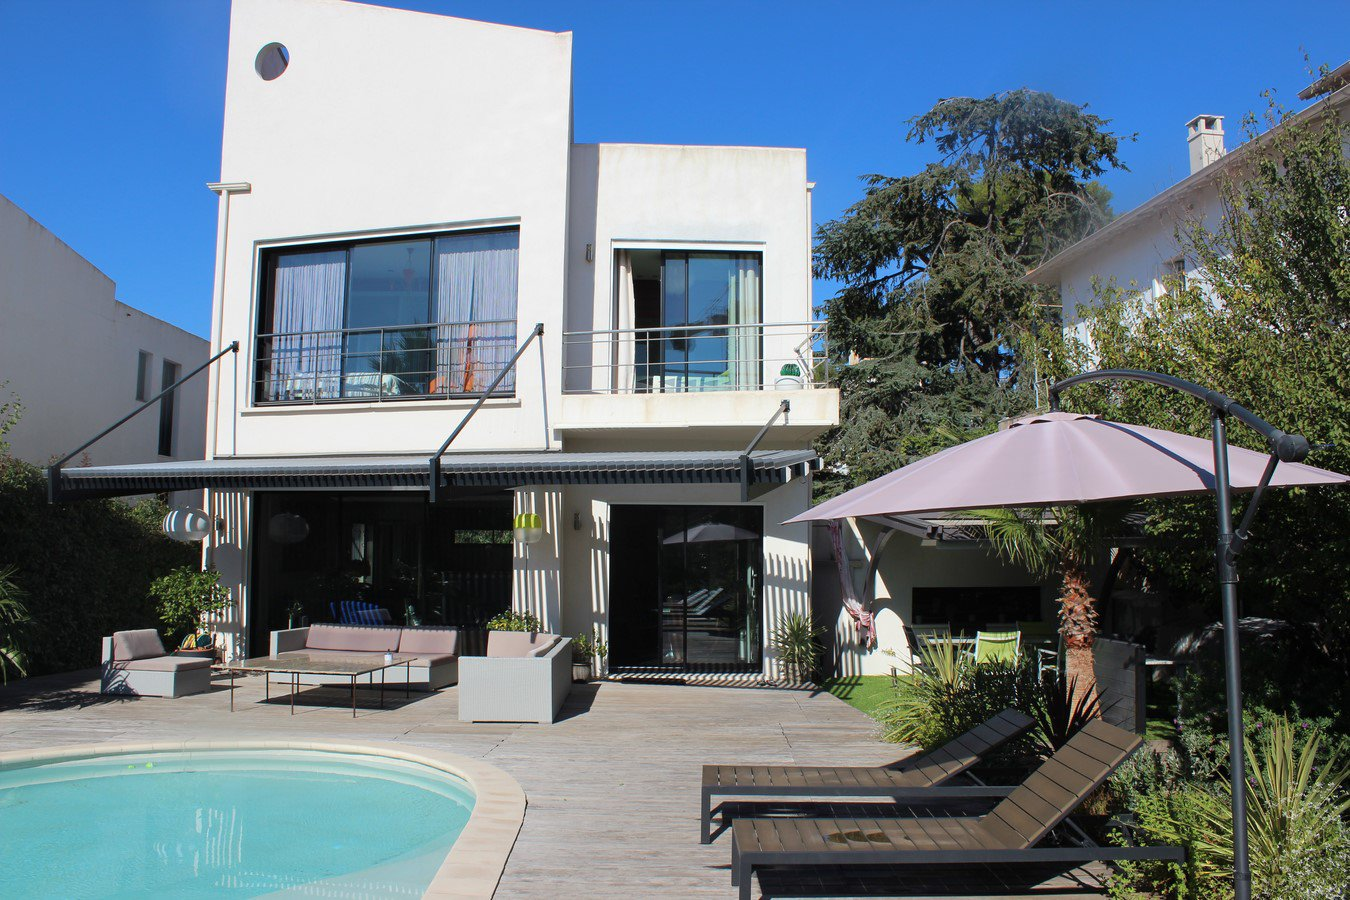 location congrès maison 4 chambres piscine